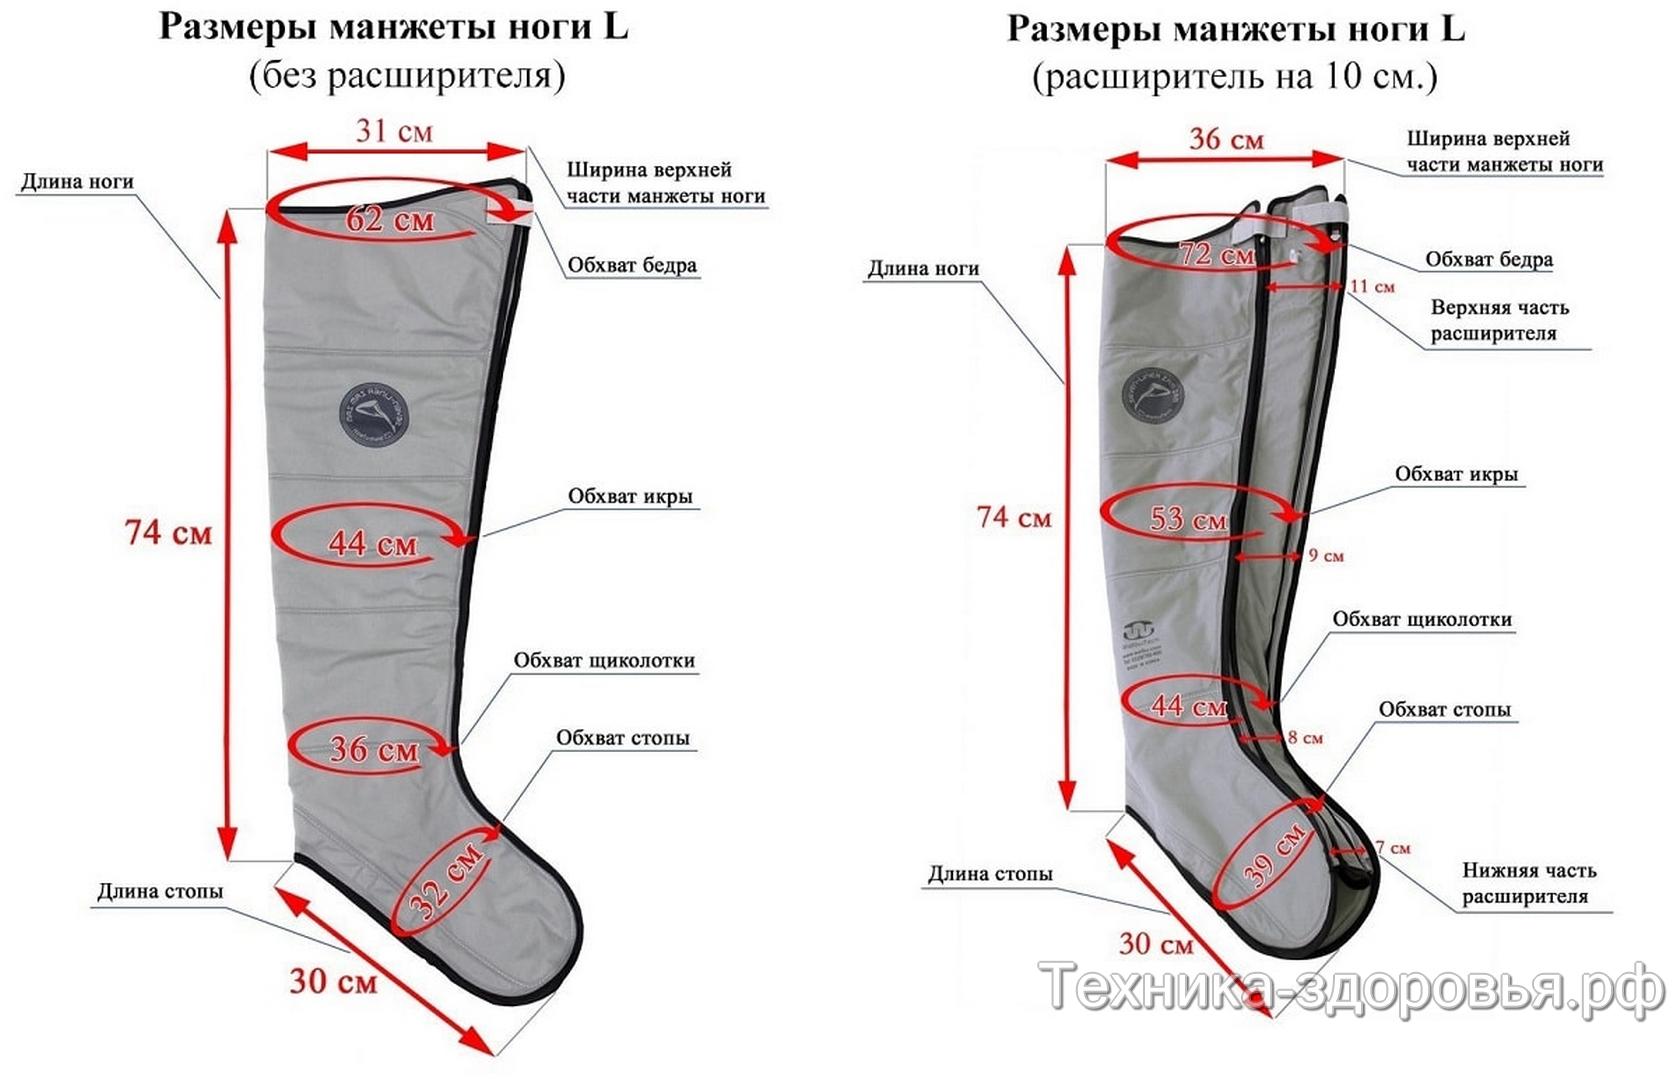 Манжета для ноги с расширителем и без